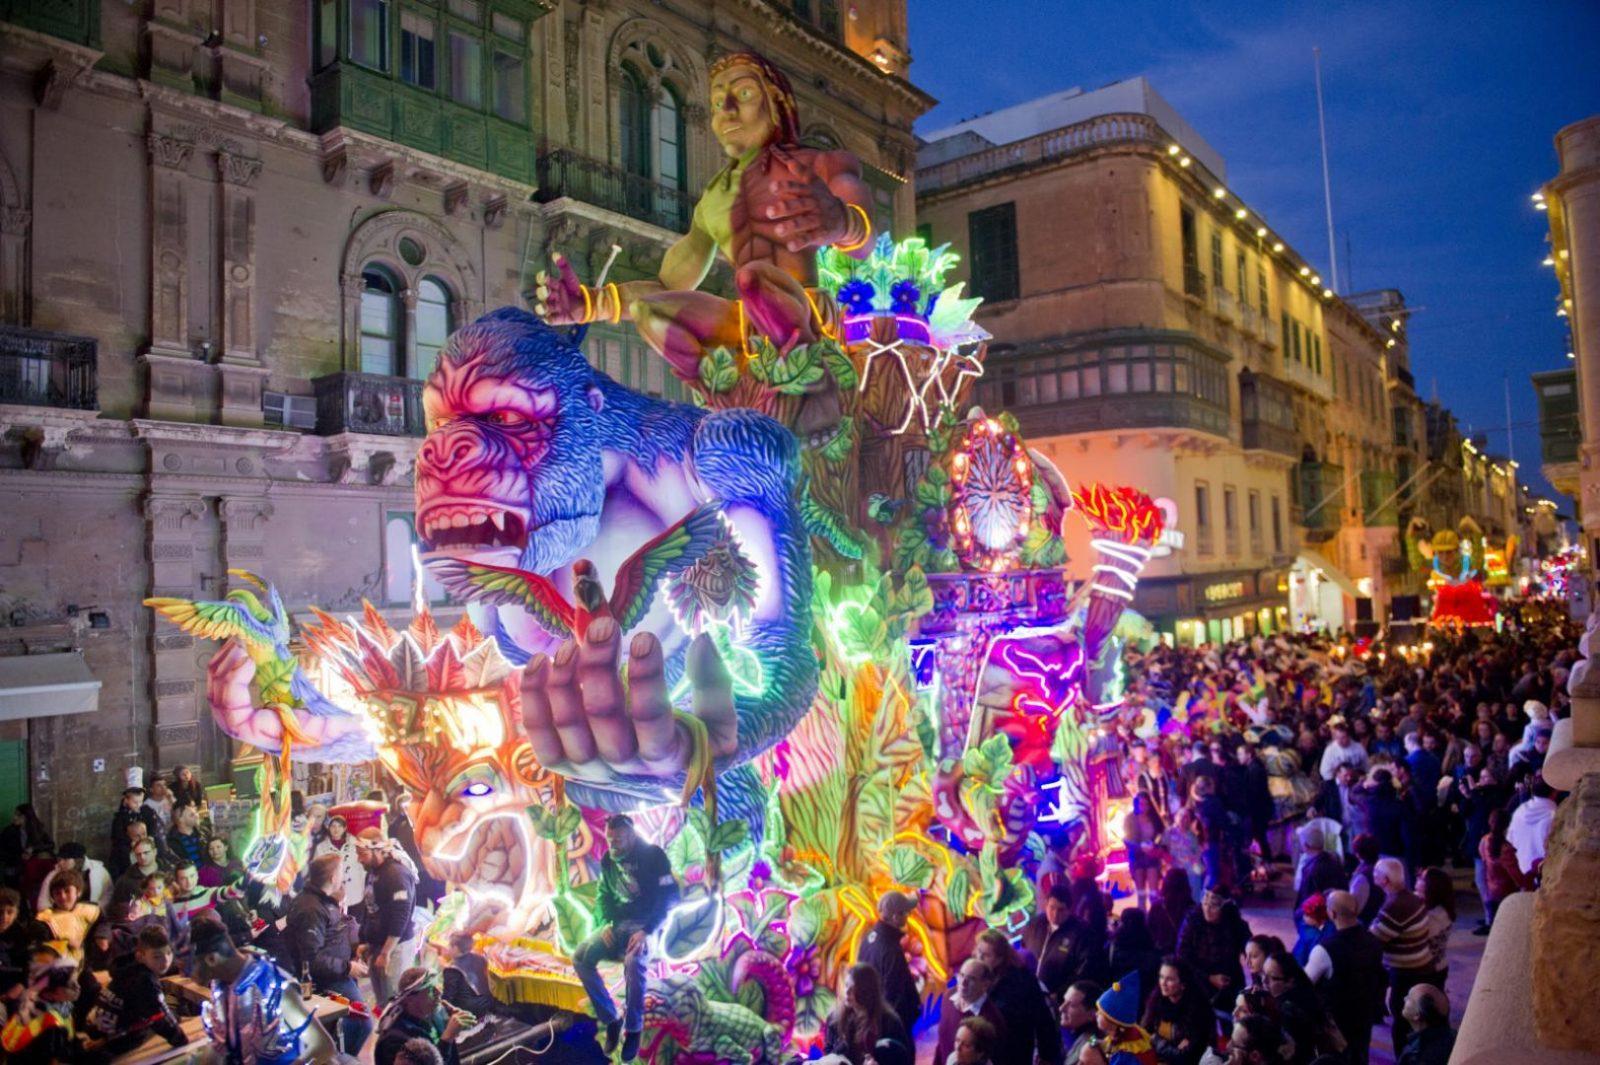 https://dancingastronaut.com/2020/02/carnival-cave-raves-a-maltese-getaway/